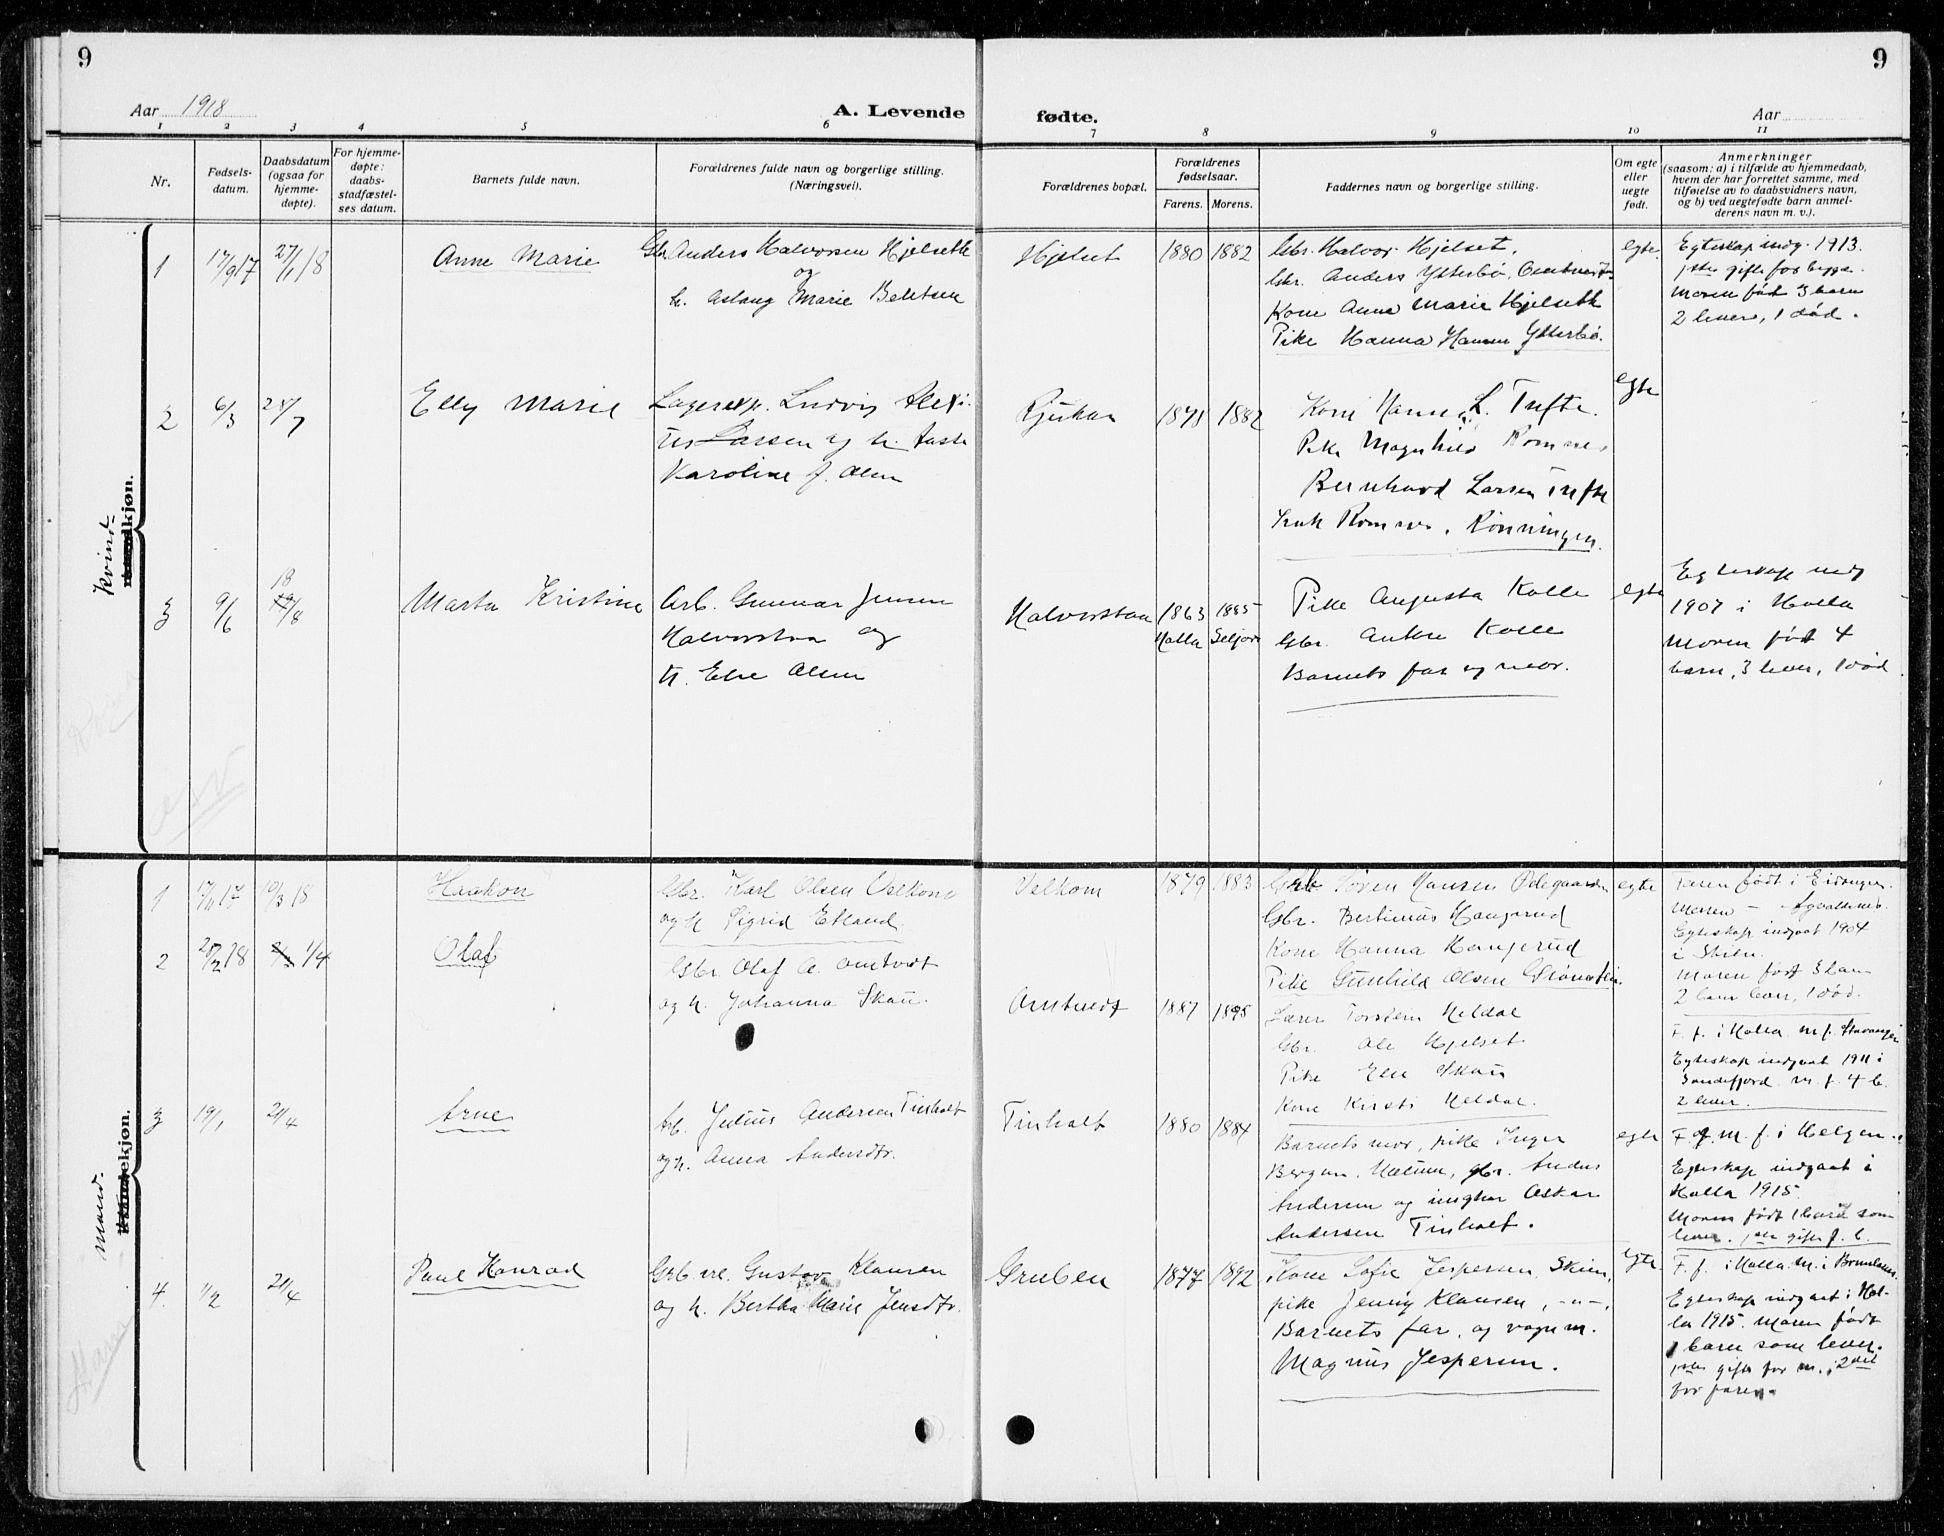 SAKO, Holla kirkebøker, G/Gb/L0003: Klokkerbok nr. II 3, 1914-1941, s. 9